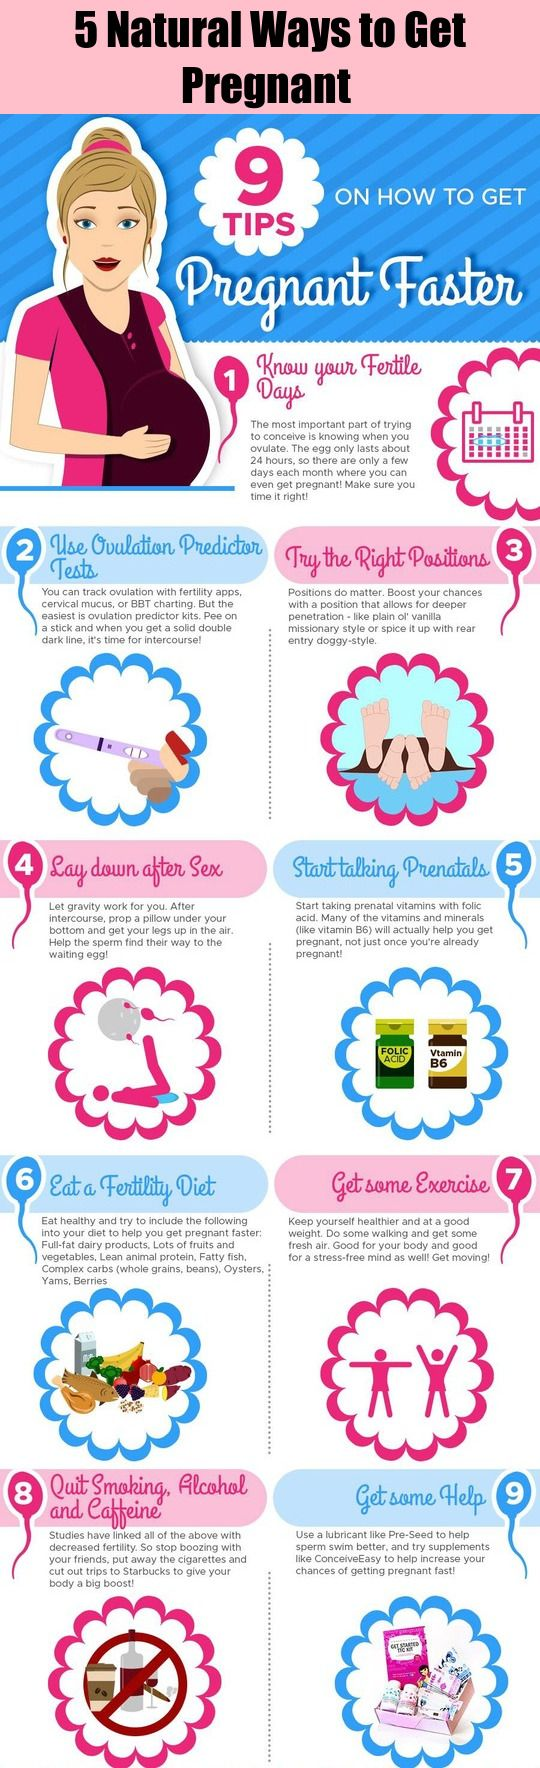 87abab193a0b2837d67b8424ae42387c - How Long Should You Lay Down To Get Pregnant